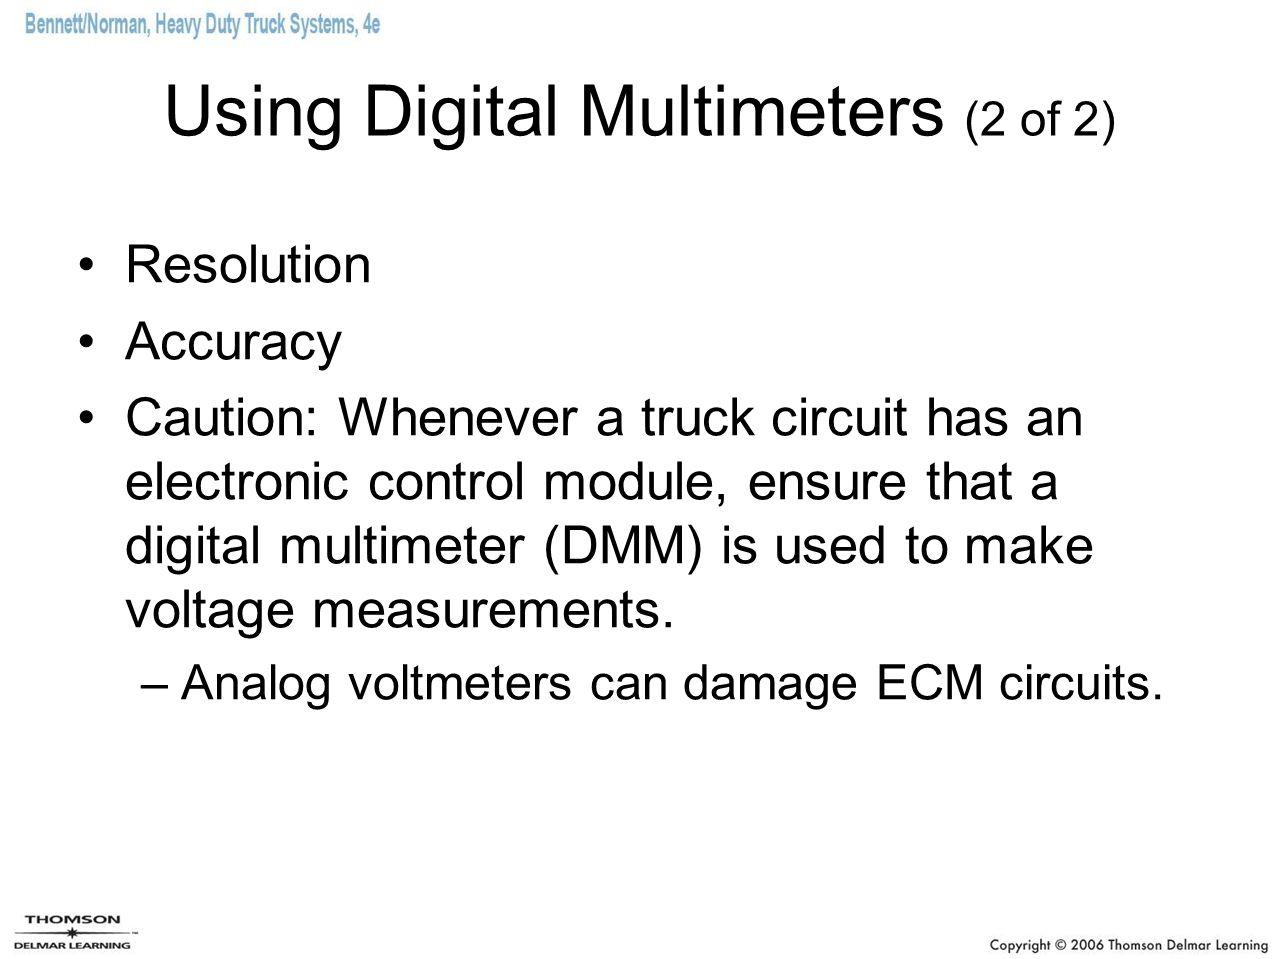 Using Digital Multimeters (2 of 2)